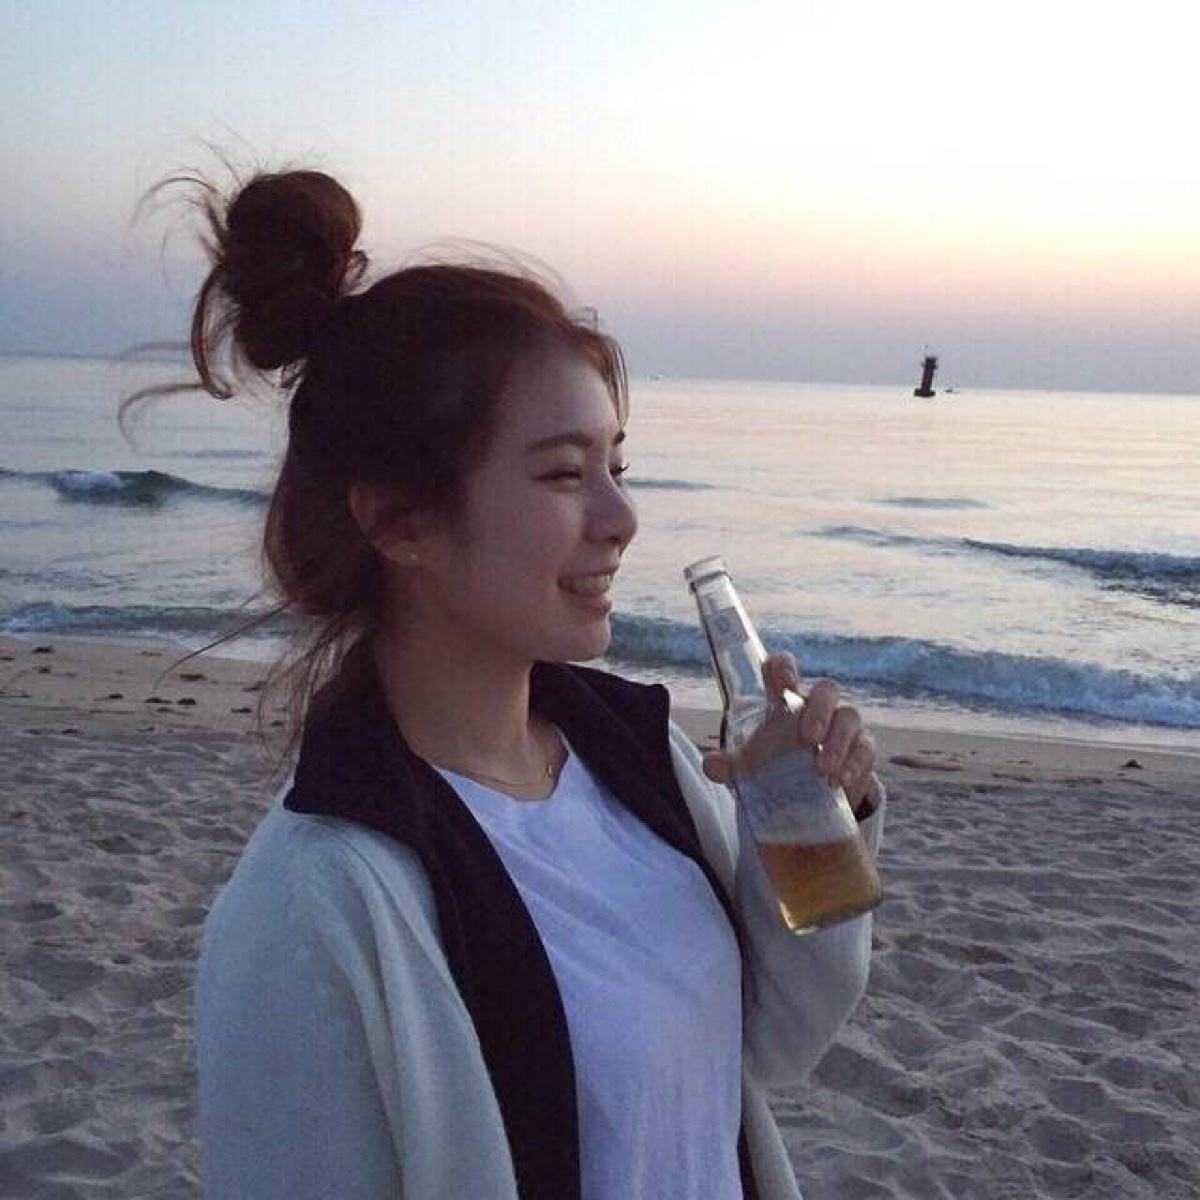 lpokjnmhuy Profile Picture